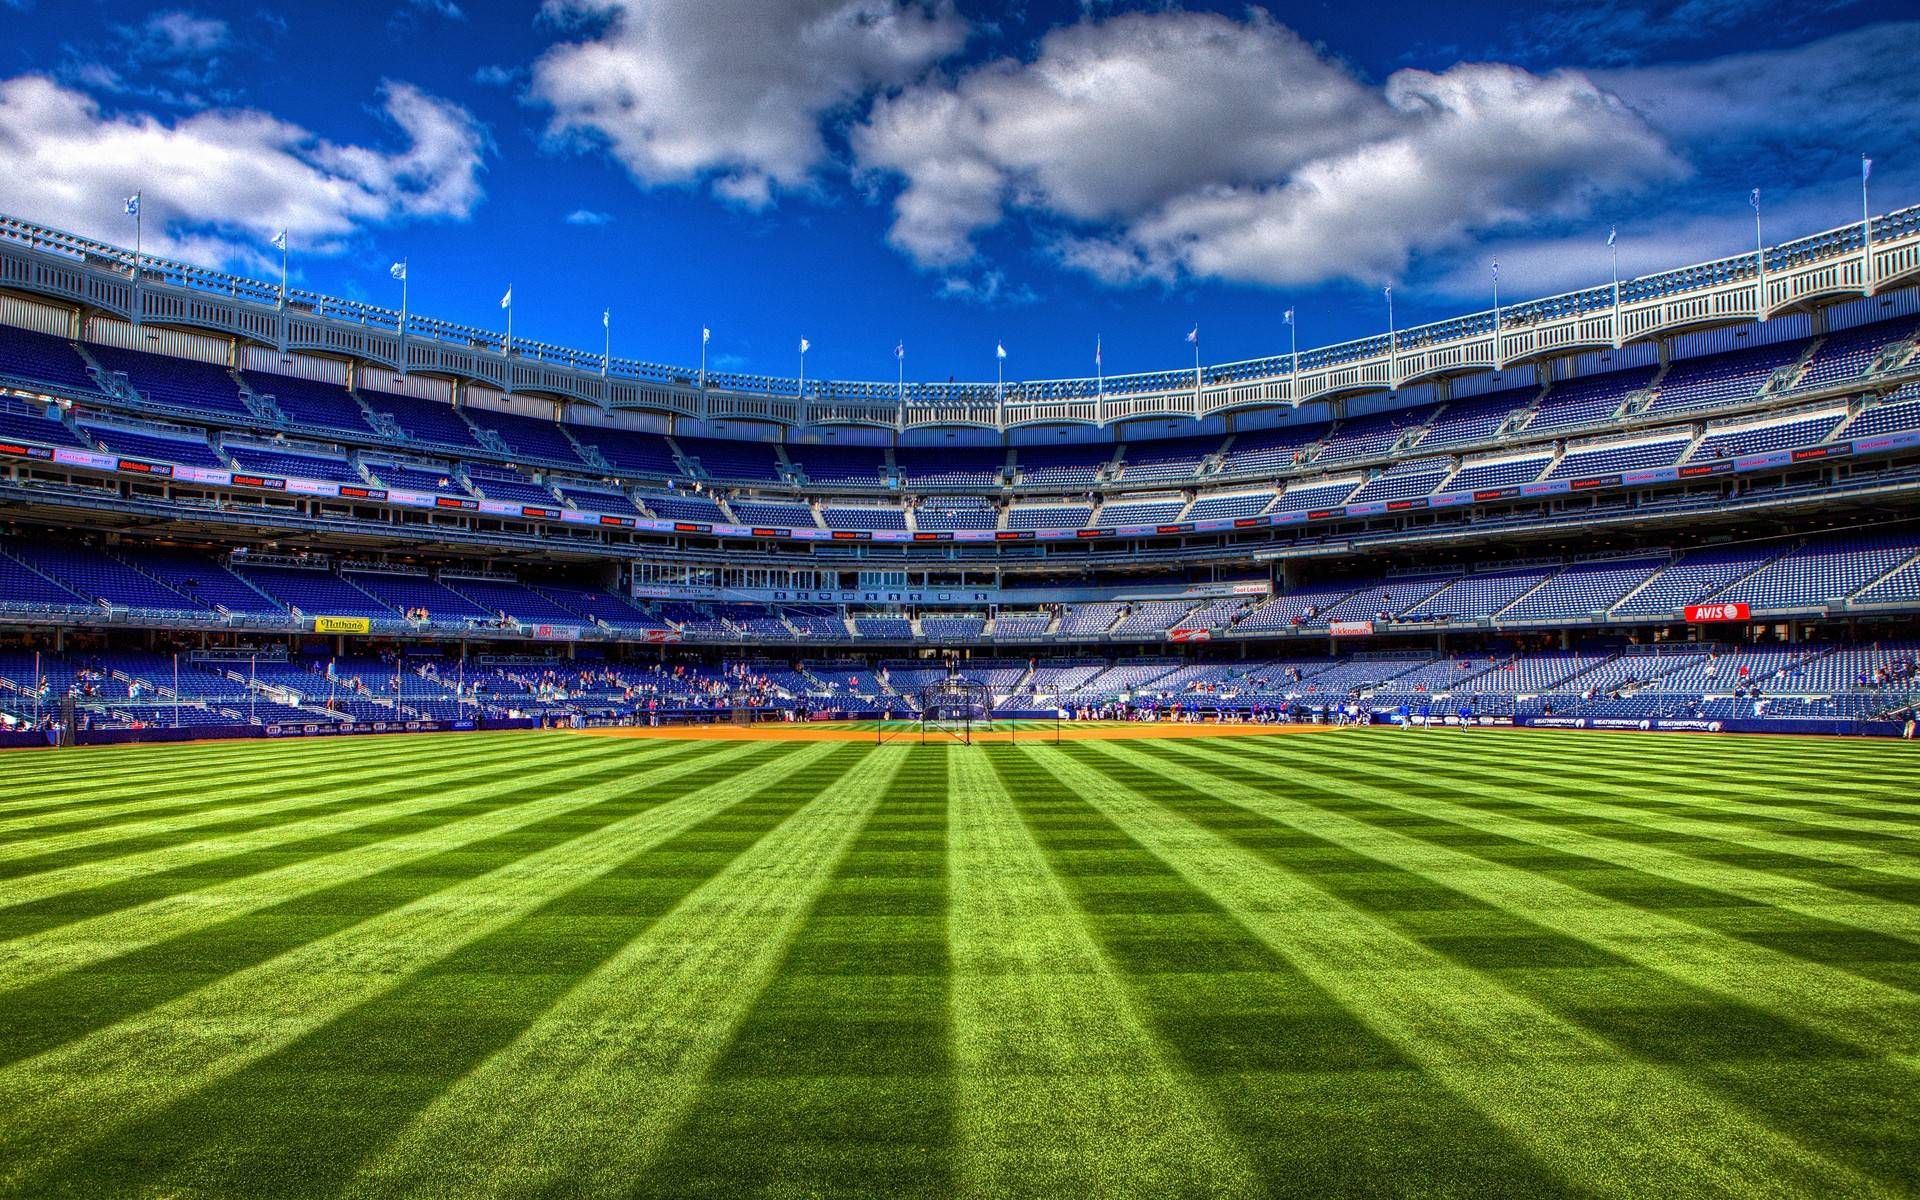 New York Yankees Backgrounds   HD Wallpapers   Pinterest   Wallpaper